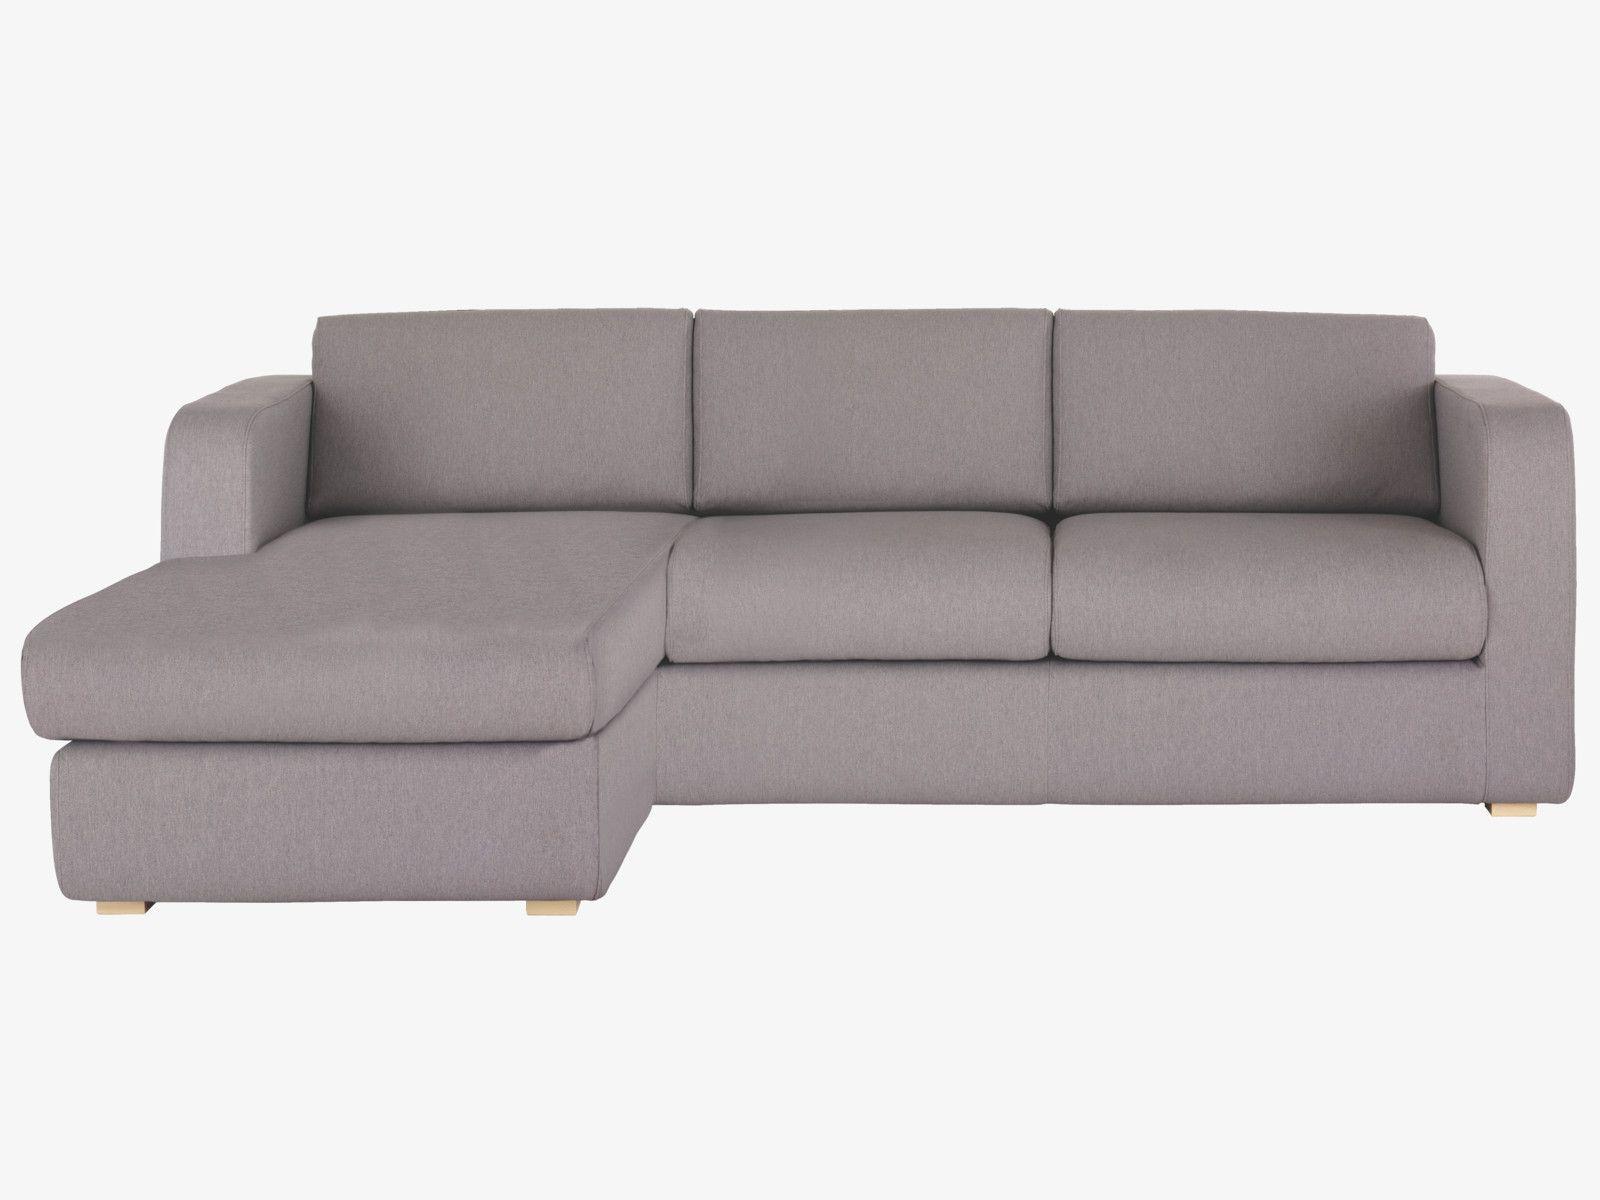 Cheap Corner Sofa Beds Dublin Lane Sectional Reviews Review Home Co